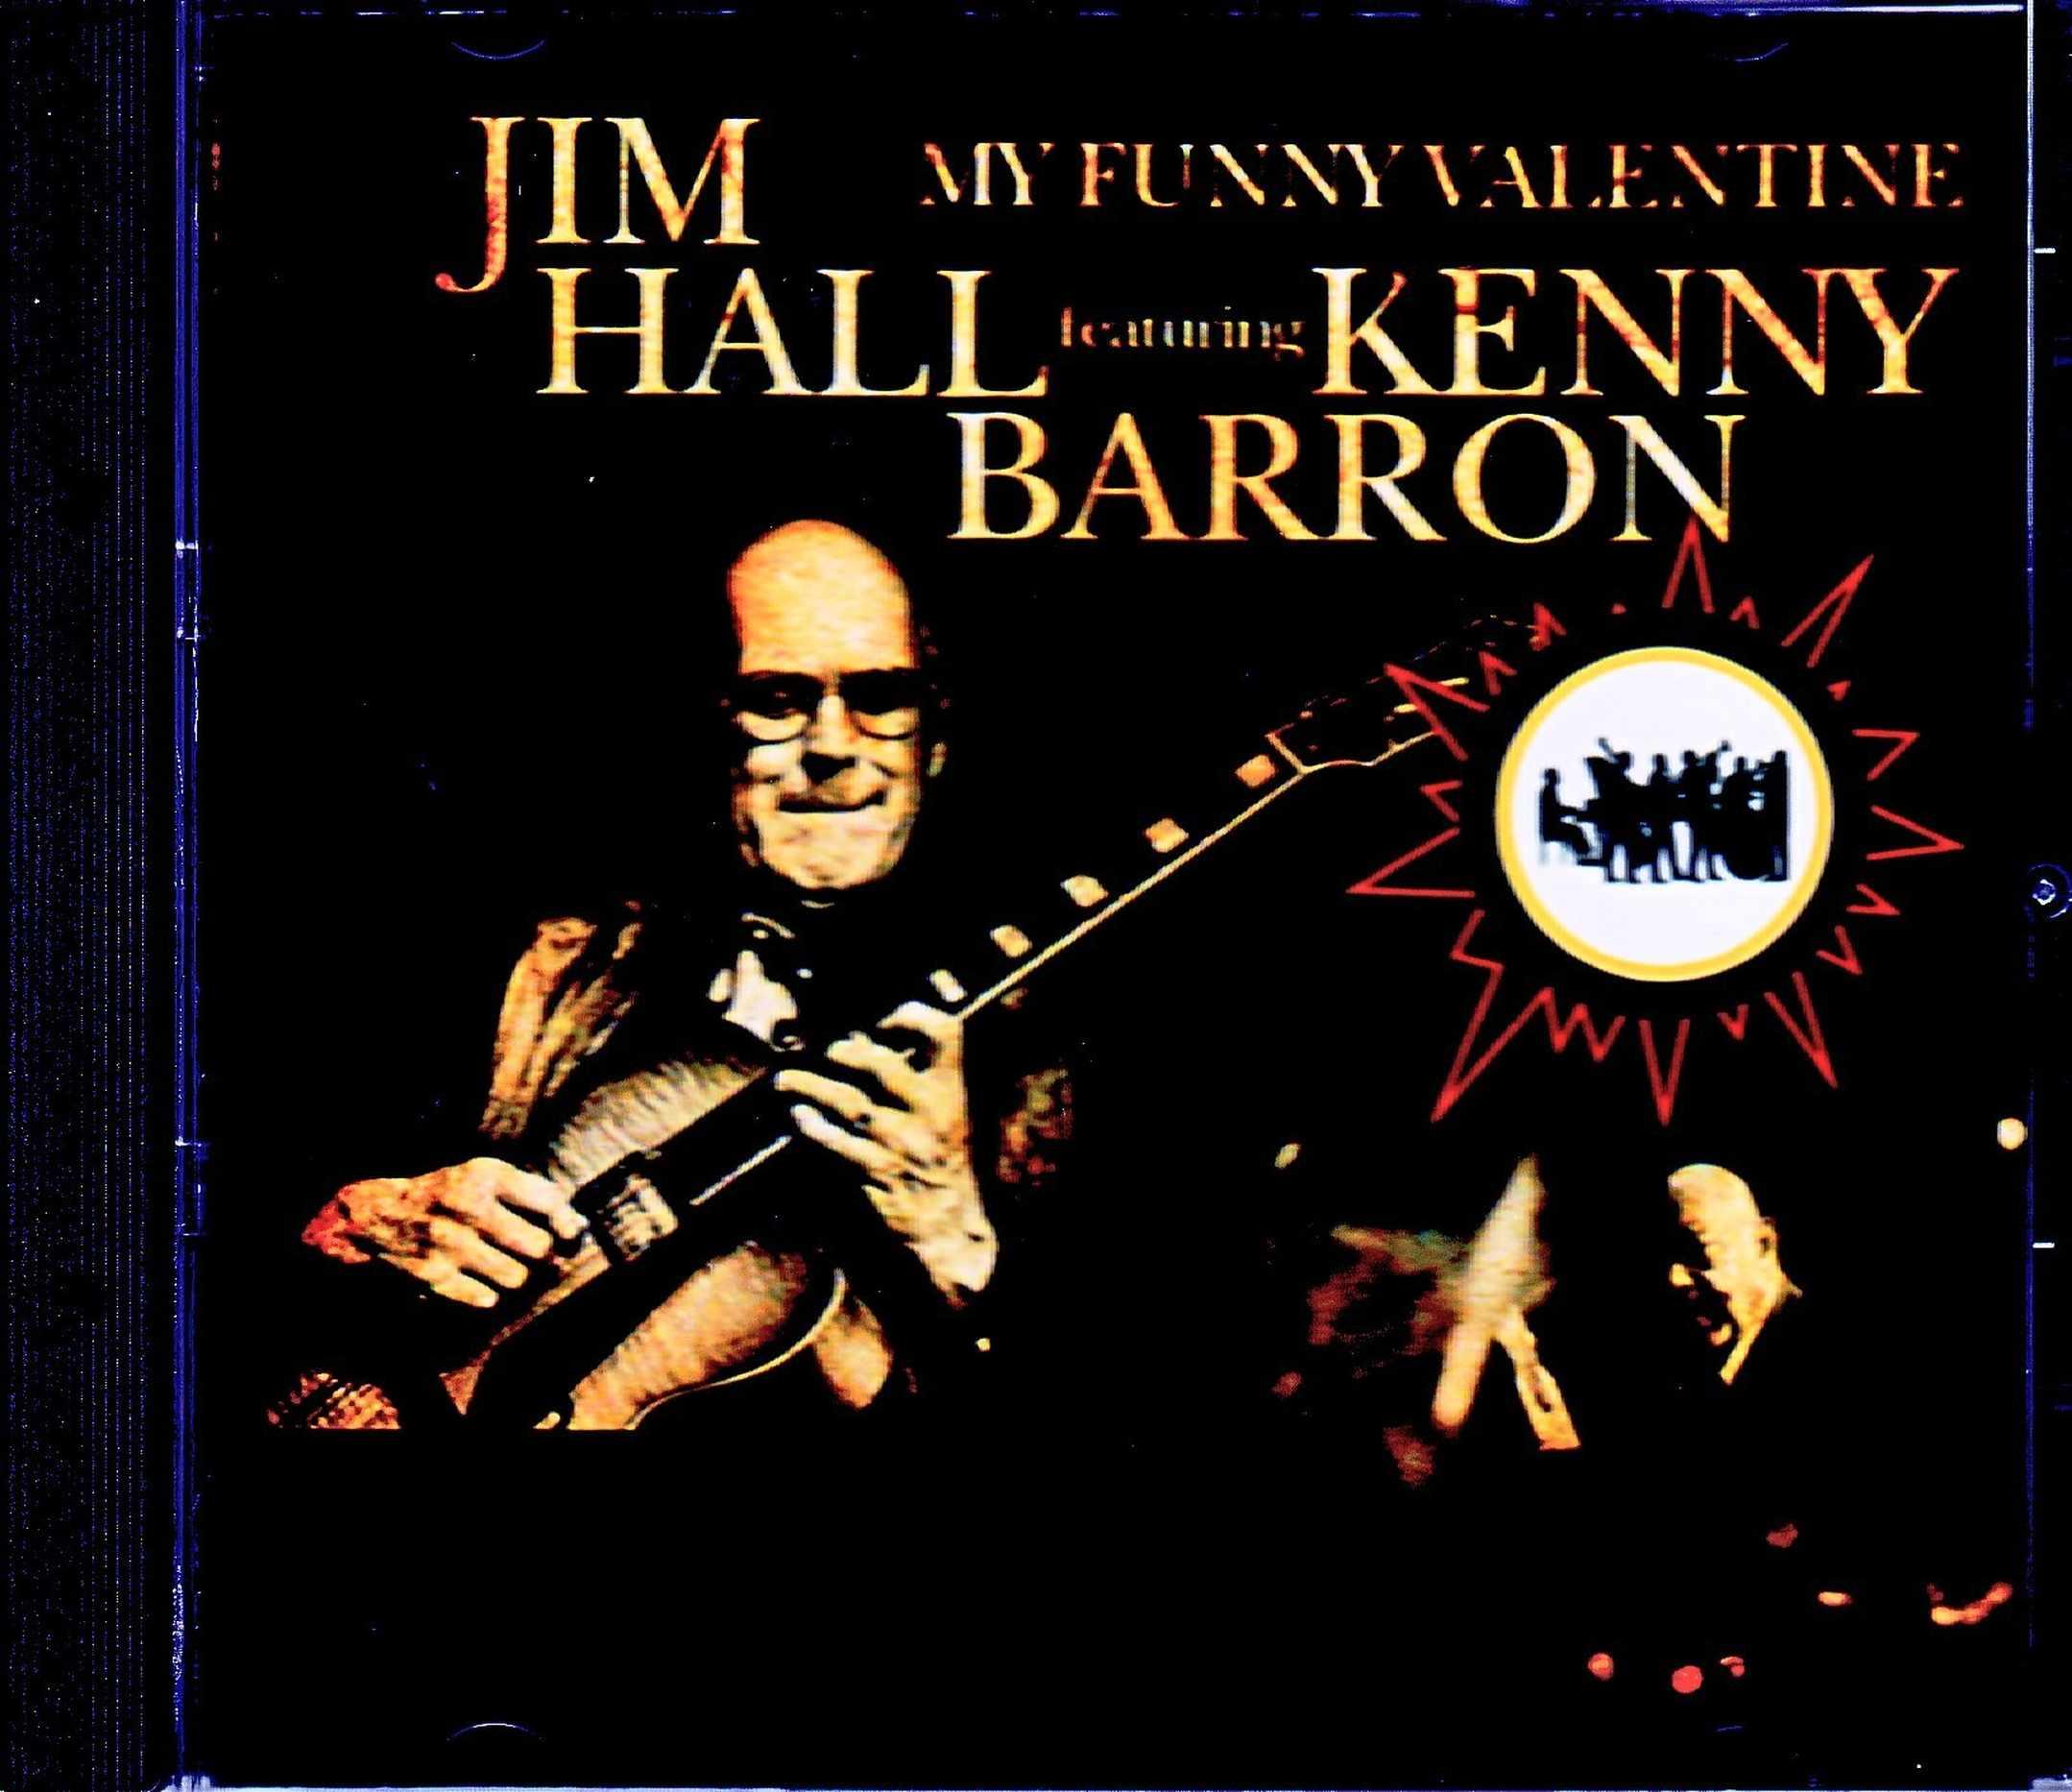 Jim Hall,Kenny Barron ジム・ホール ケニー・バロン/Tokyo,Japan 1997